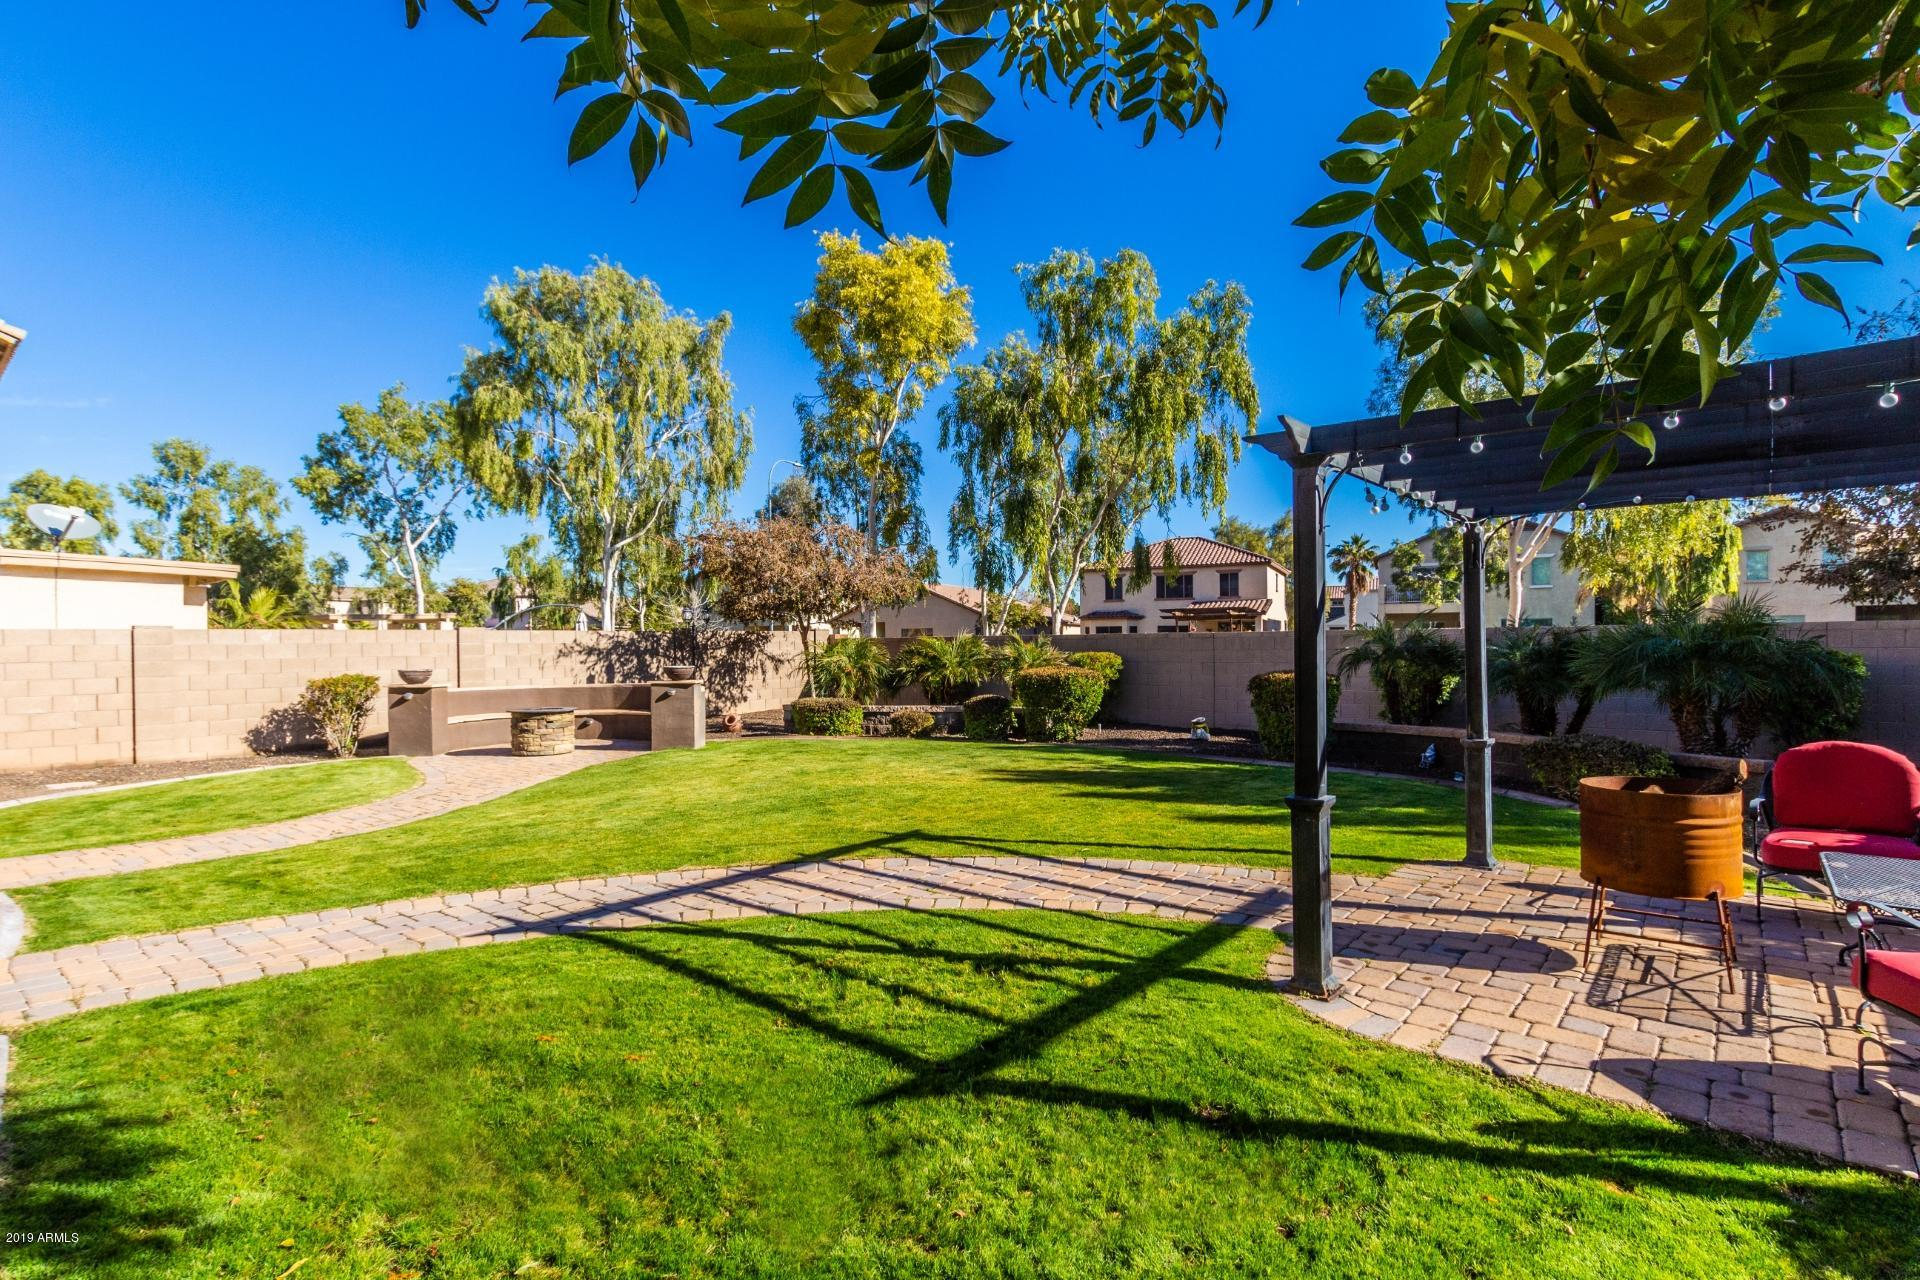 MLS 5865270 805 S 118TH Drive, Avondale, AZ 85323 Avondale AZ Glenhurst